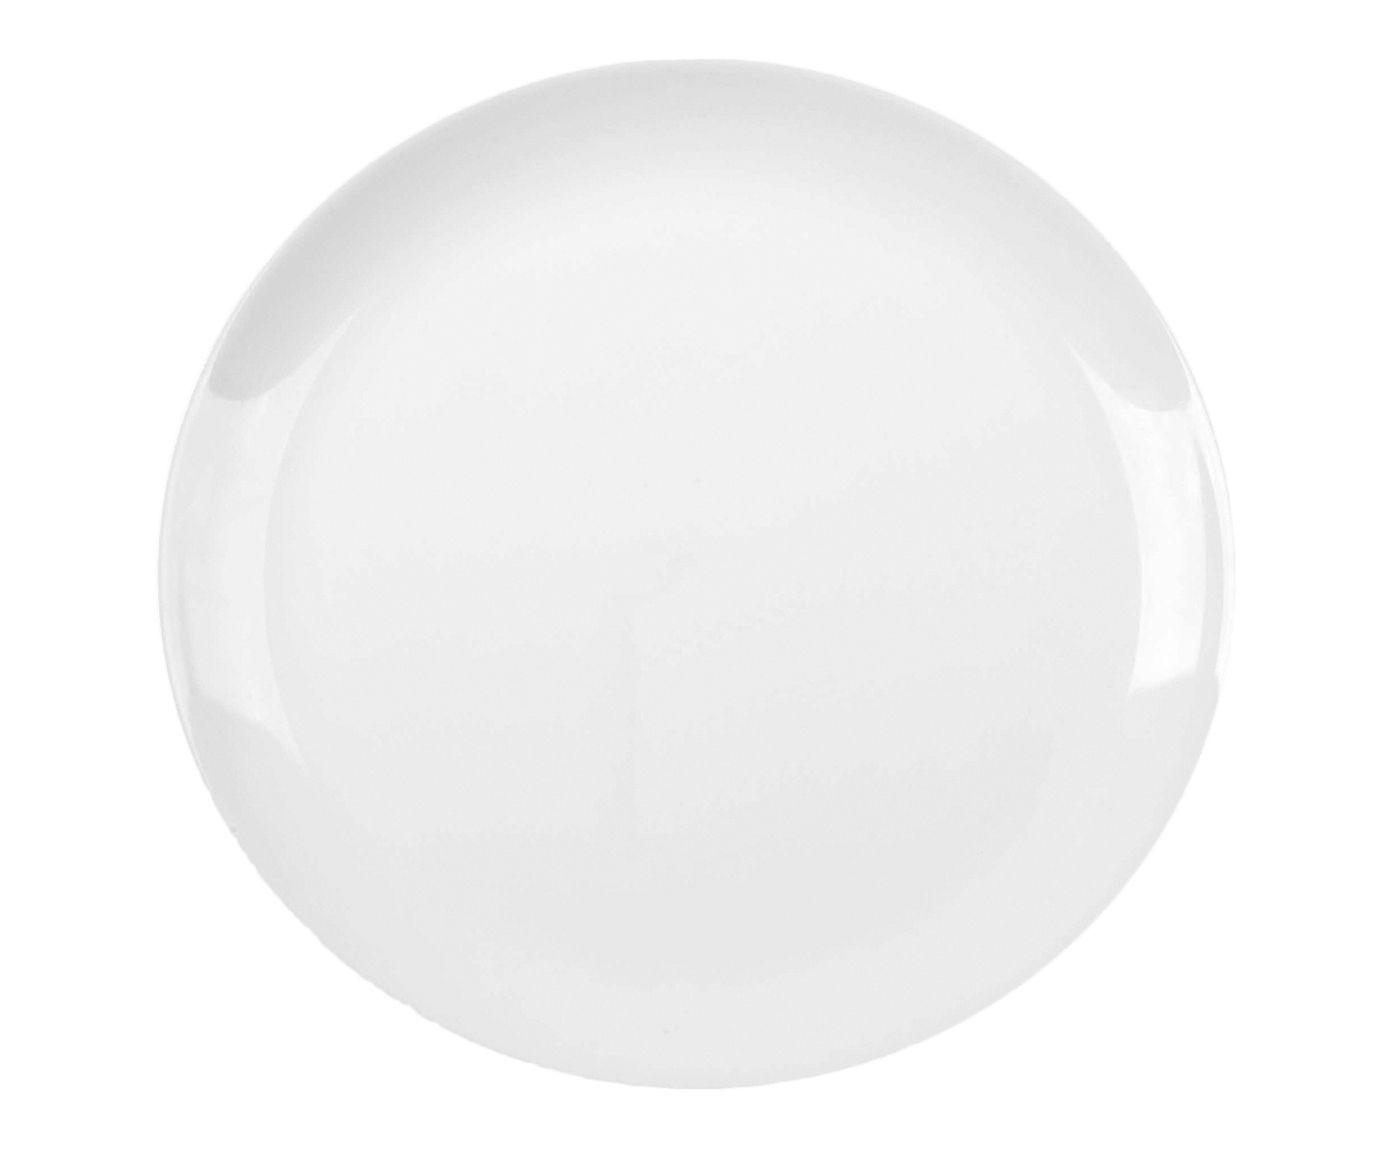 Prato Raso Blanc - 27cm | Westwing.com.br